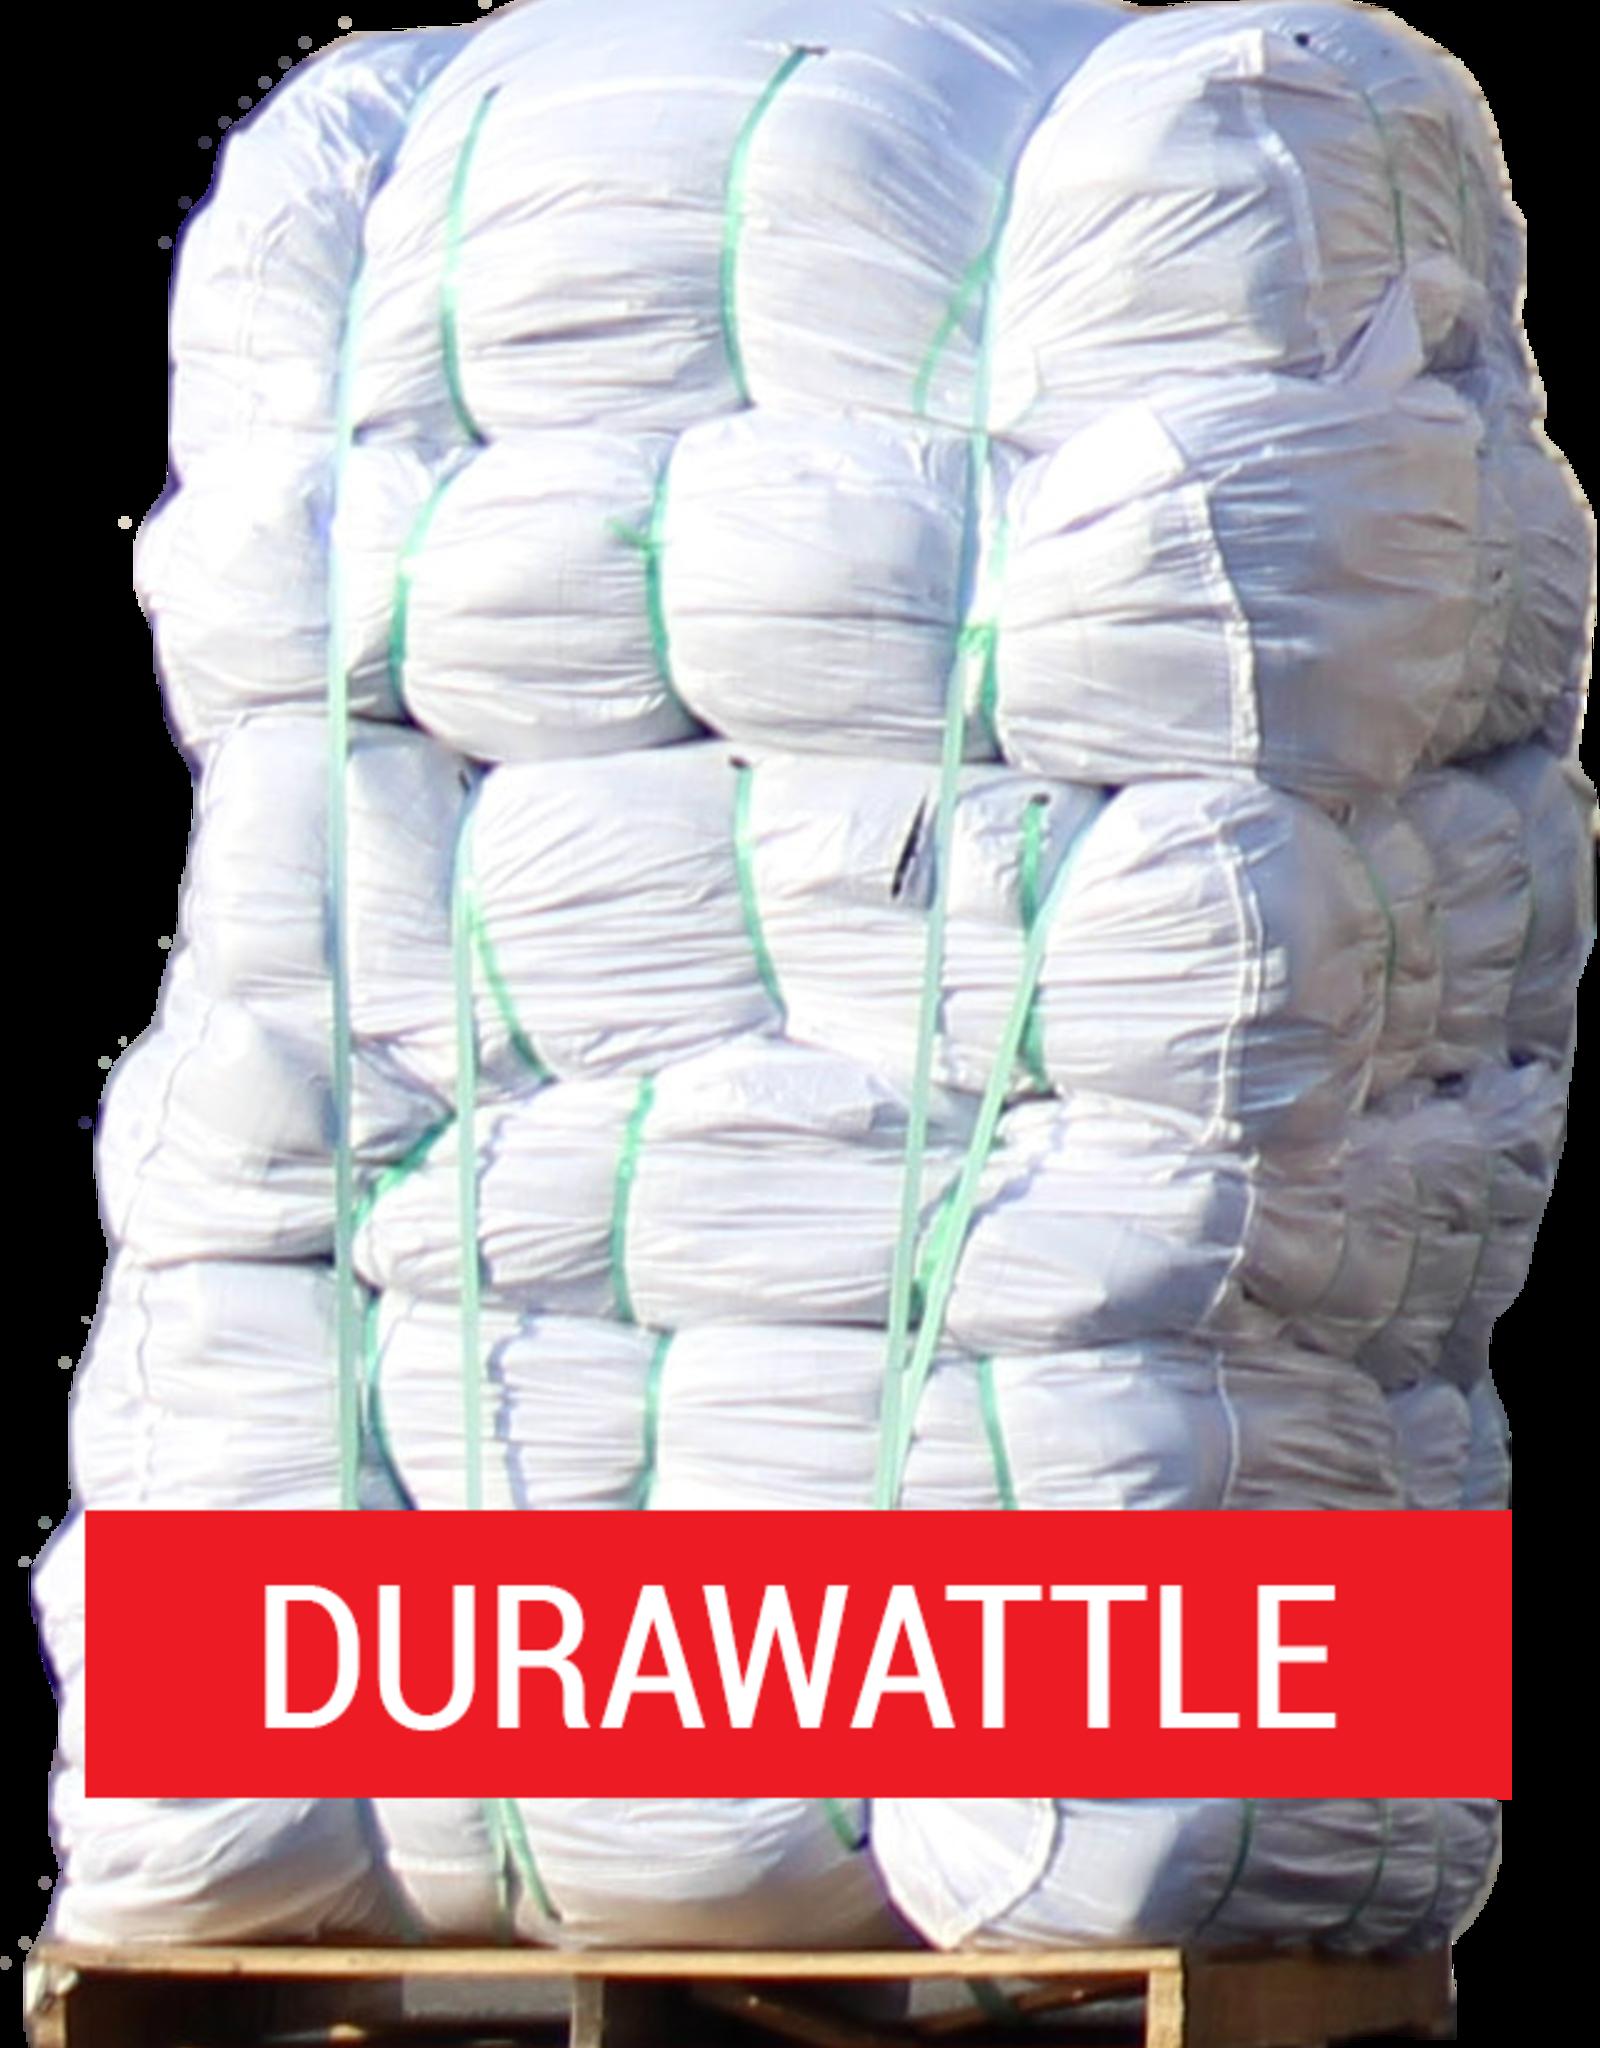 "Durawattle DuraWattle SZ. 5.5"" x 18' w/18"" flap"